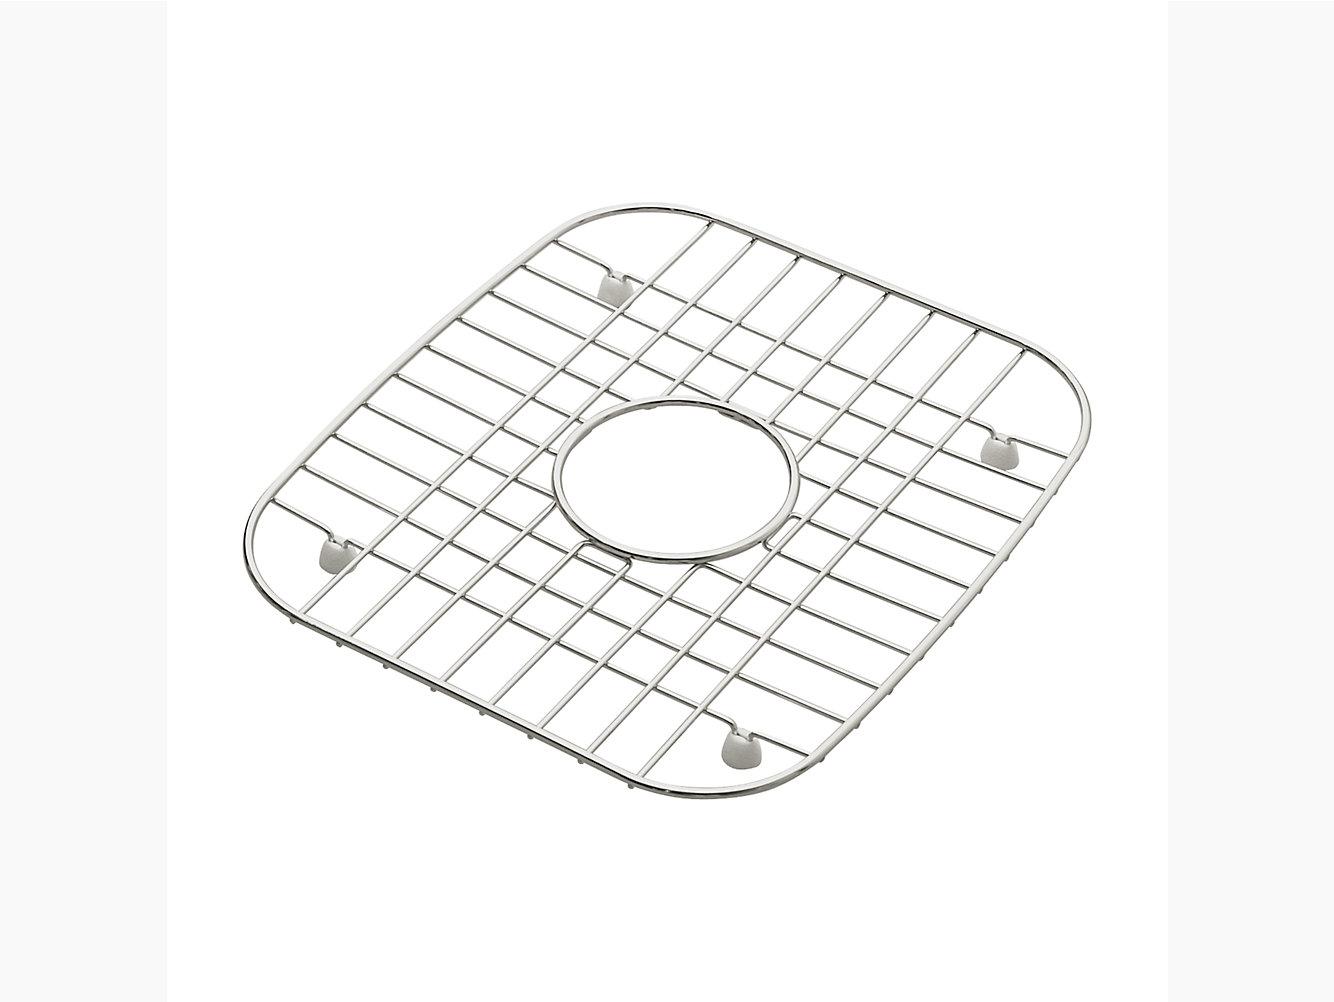 Stainless Steel Sink Rack | 11862-ST | STERLING